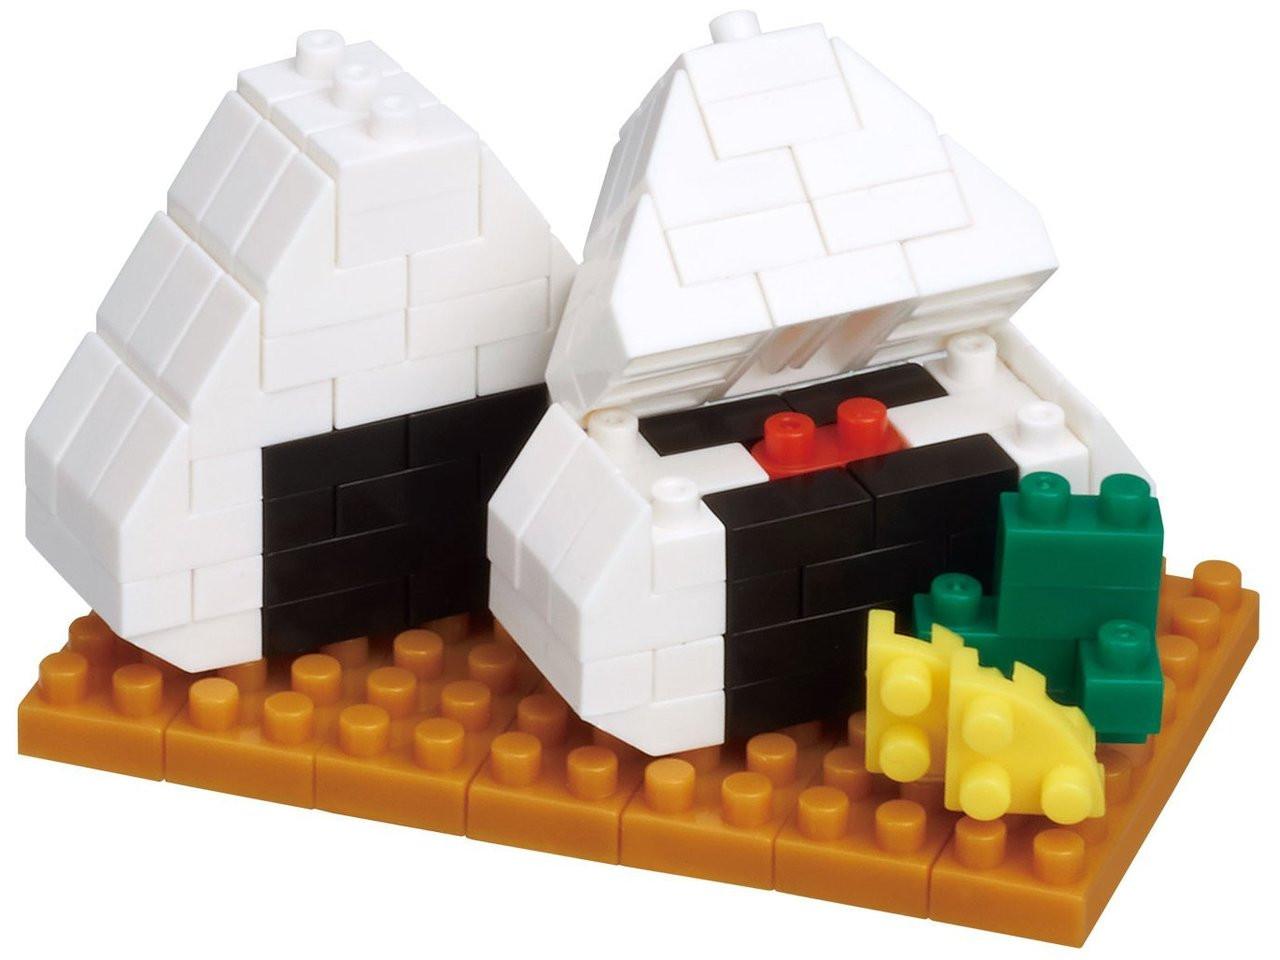 Nano-block Nano-block sushi NBC 220 Building Block Kit From Japan F//S